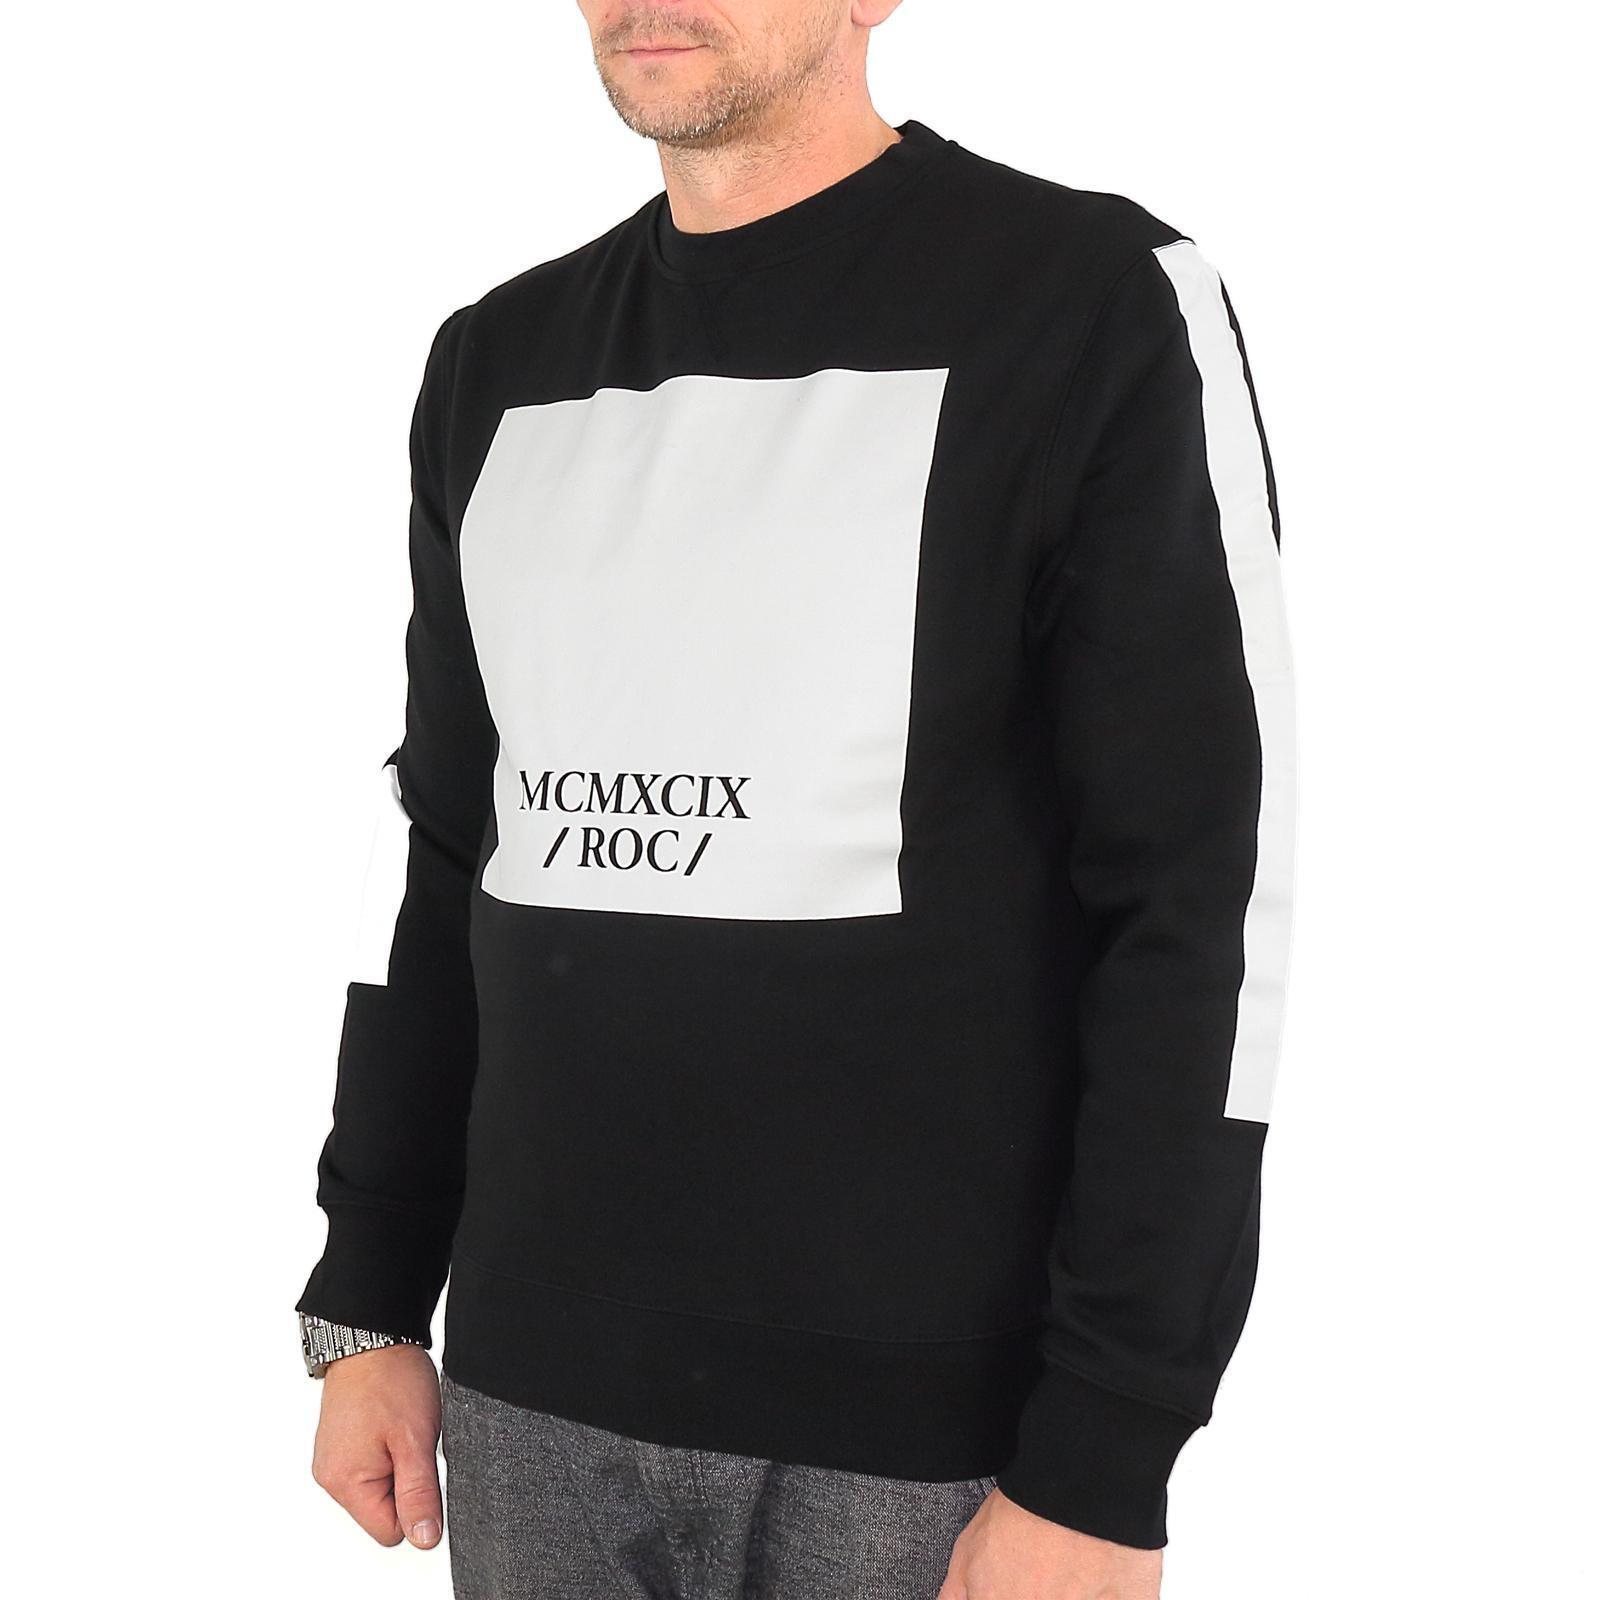 Rocawear Rocawear Rocawear MCM XCIX sweatpulli Uomo Pullover, colore nero, 30935 46efd7